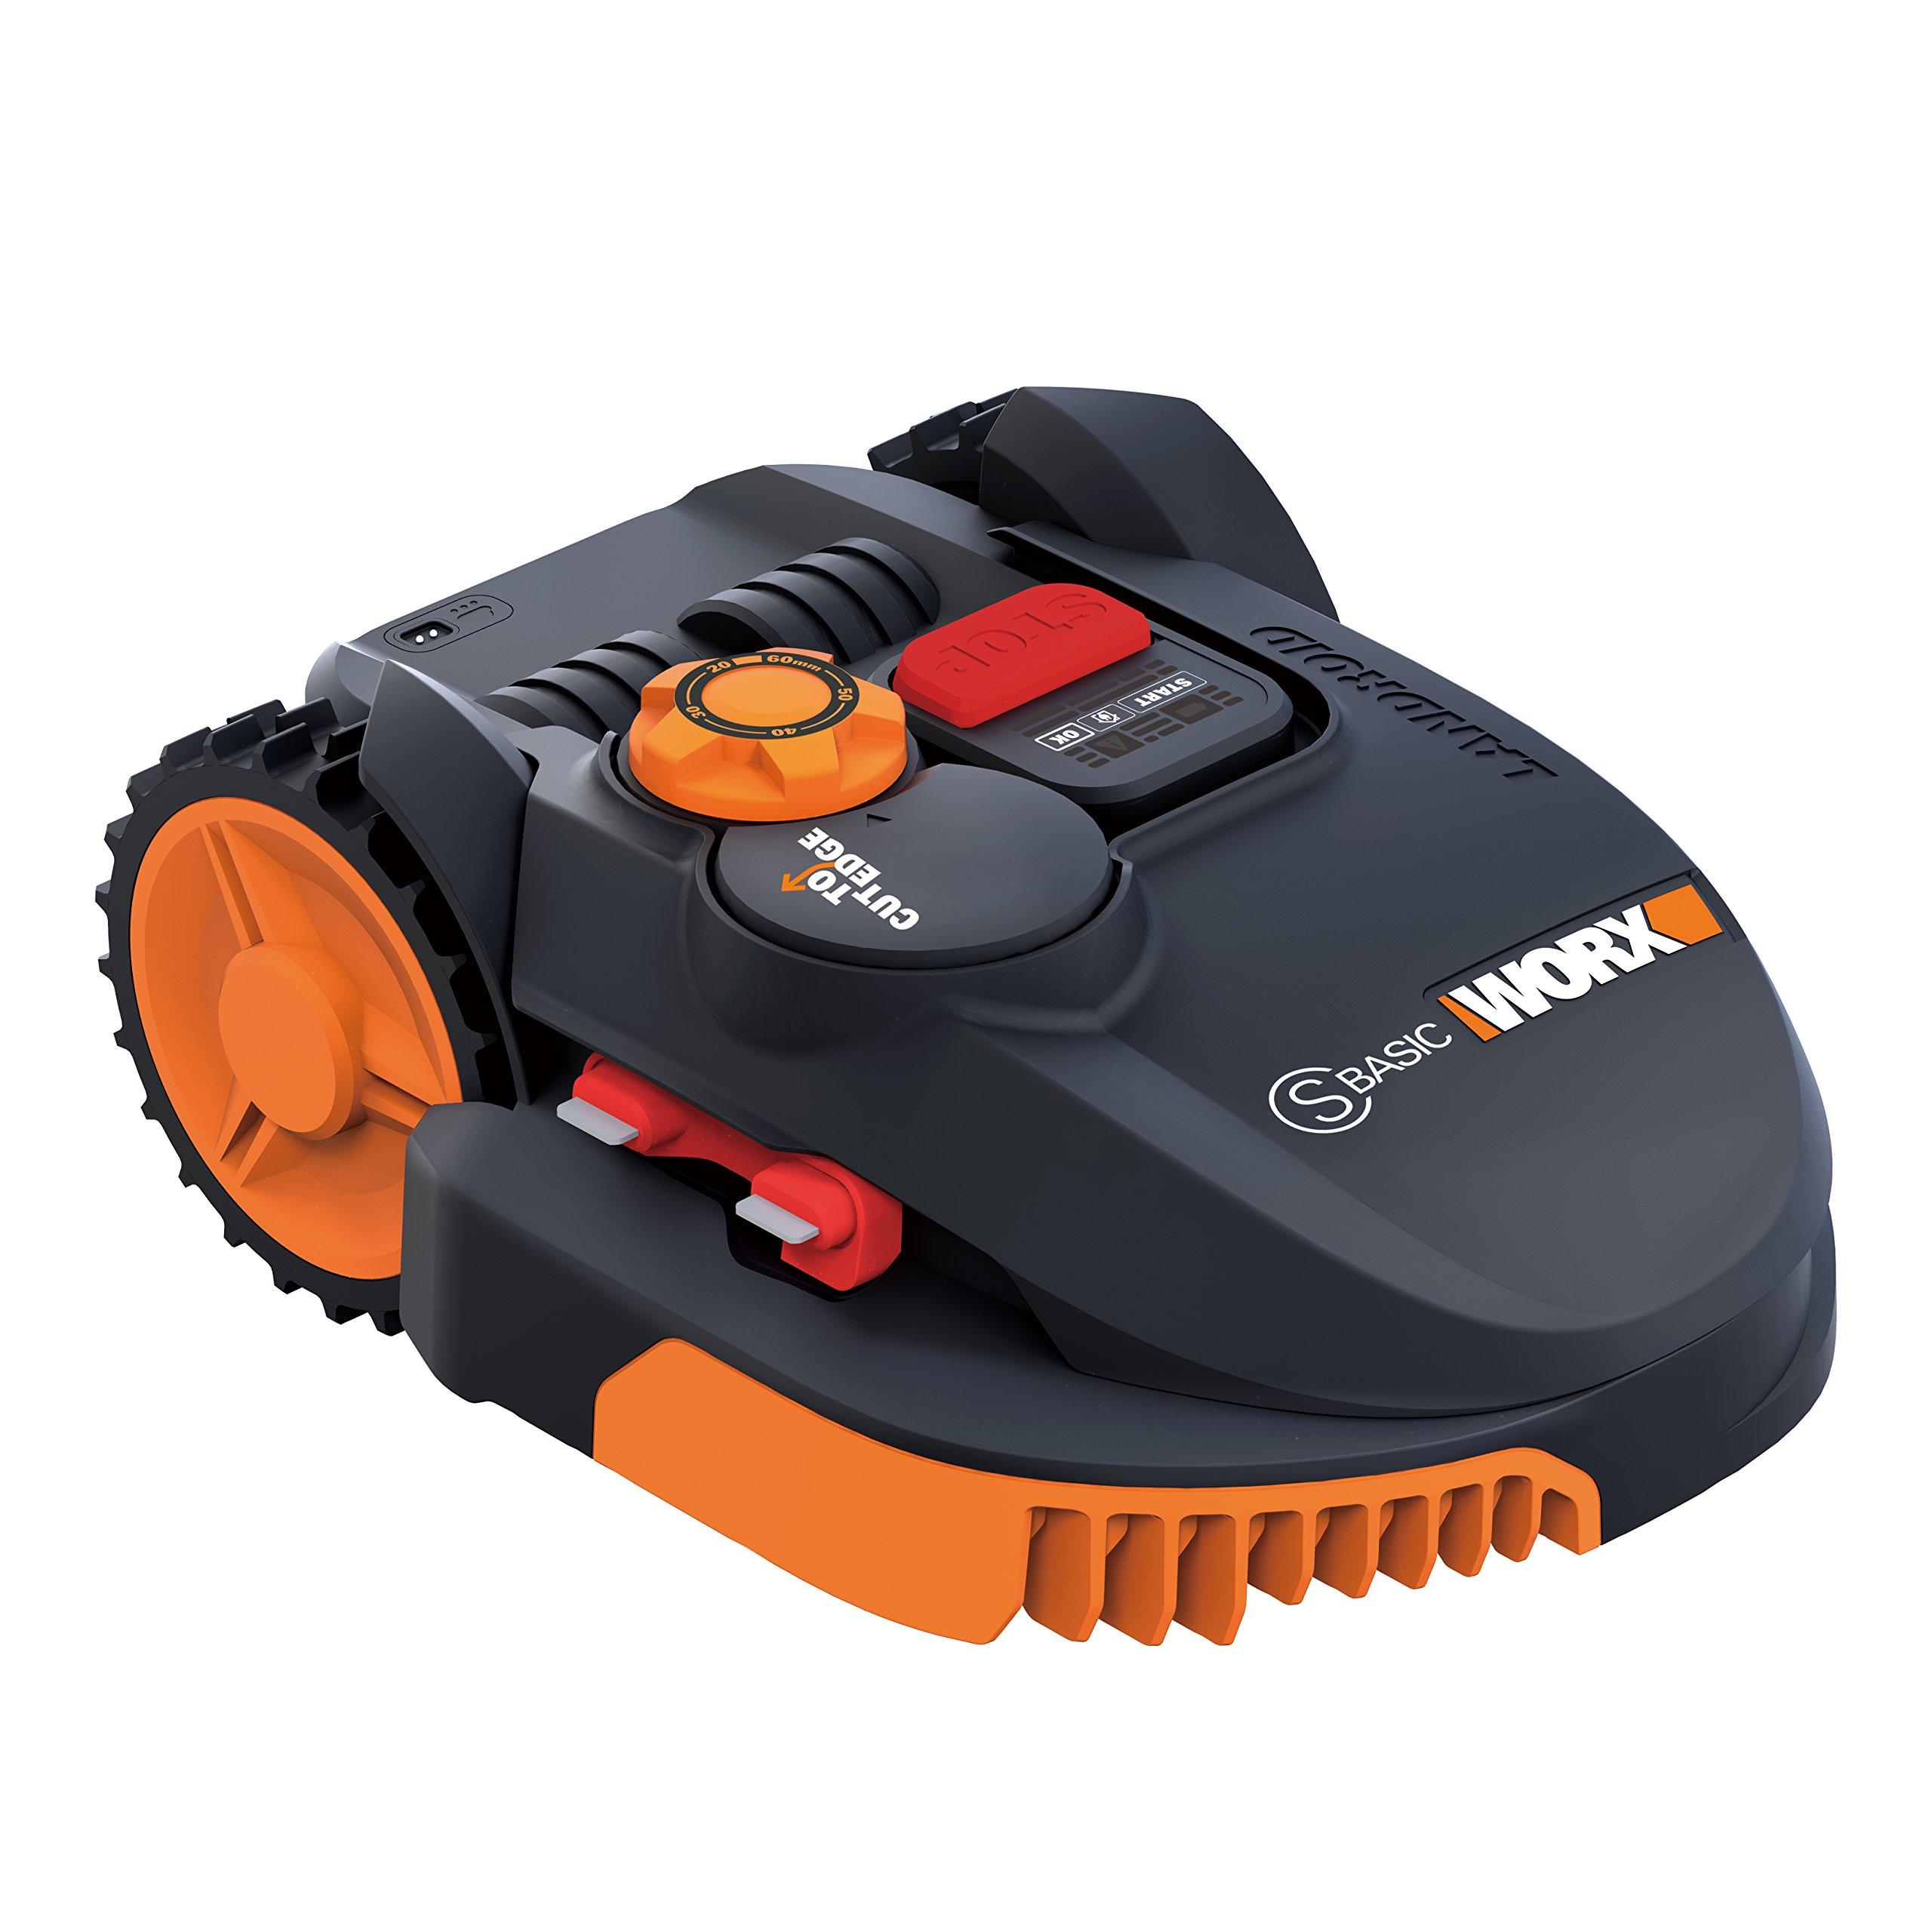 Worx-wr094s-Mhroboter-Landroid-36-W-20-V-Schwarz-Orange-350-qm